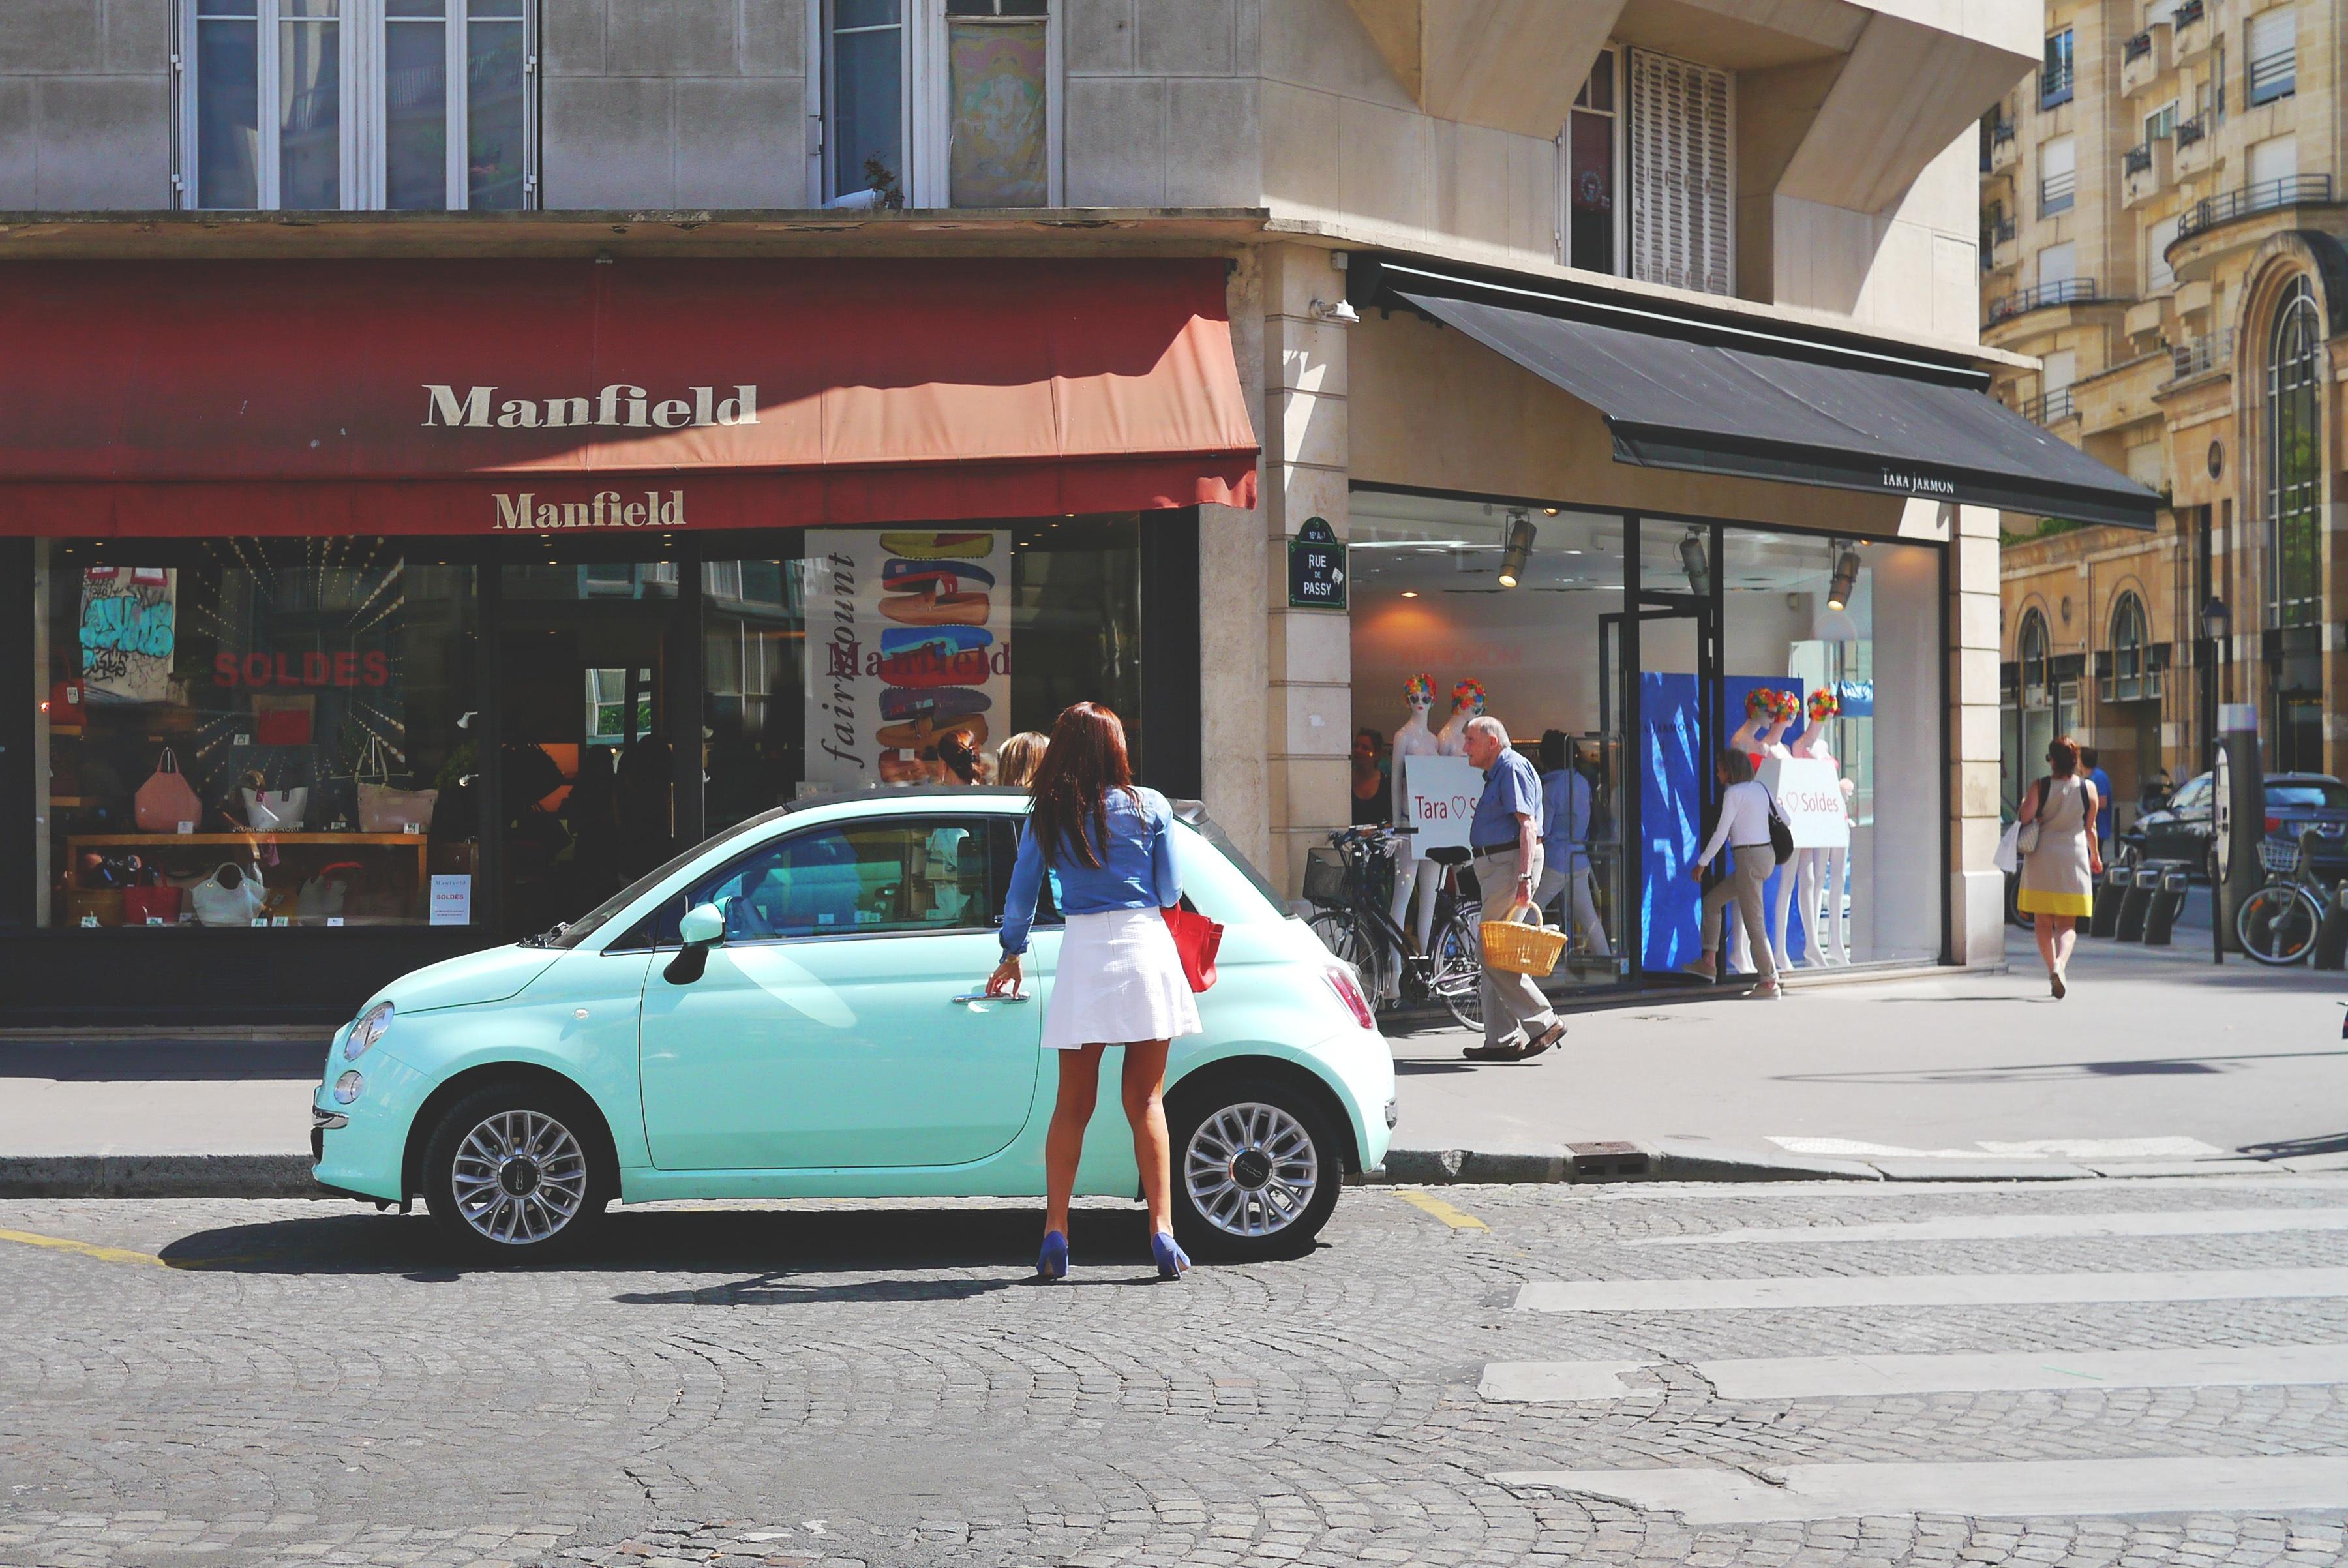 City Street, Activity, Architecture, Auto, Automobile, HQ Photo